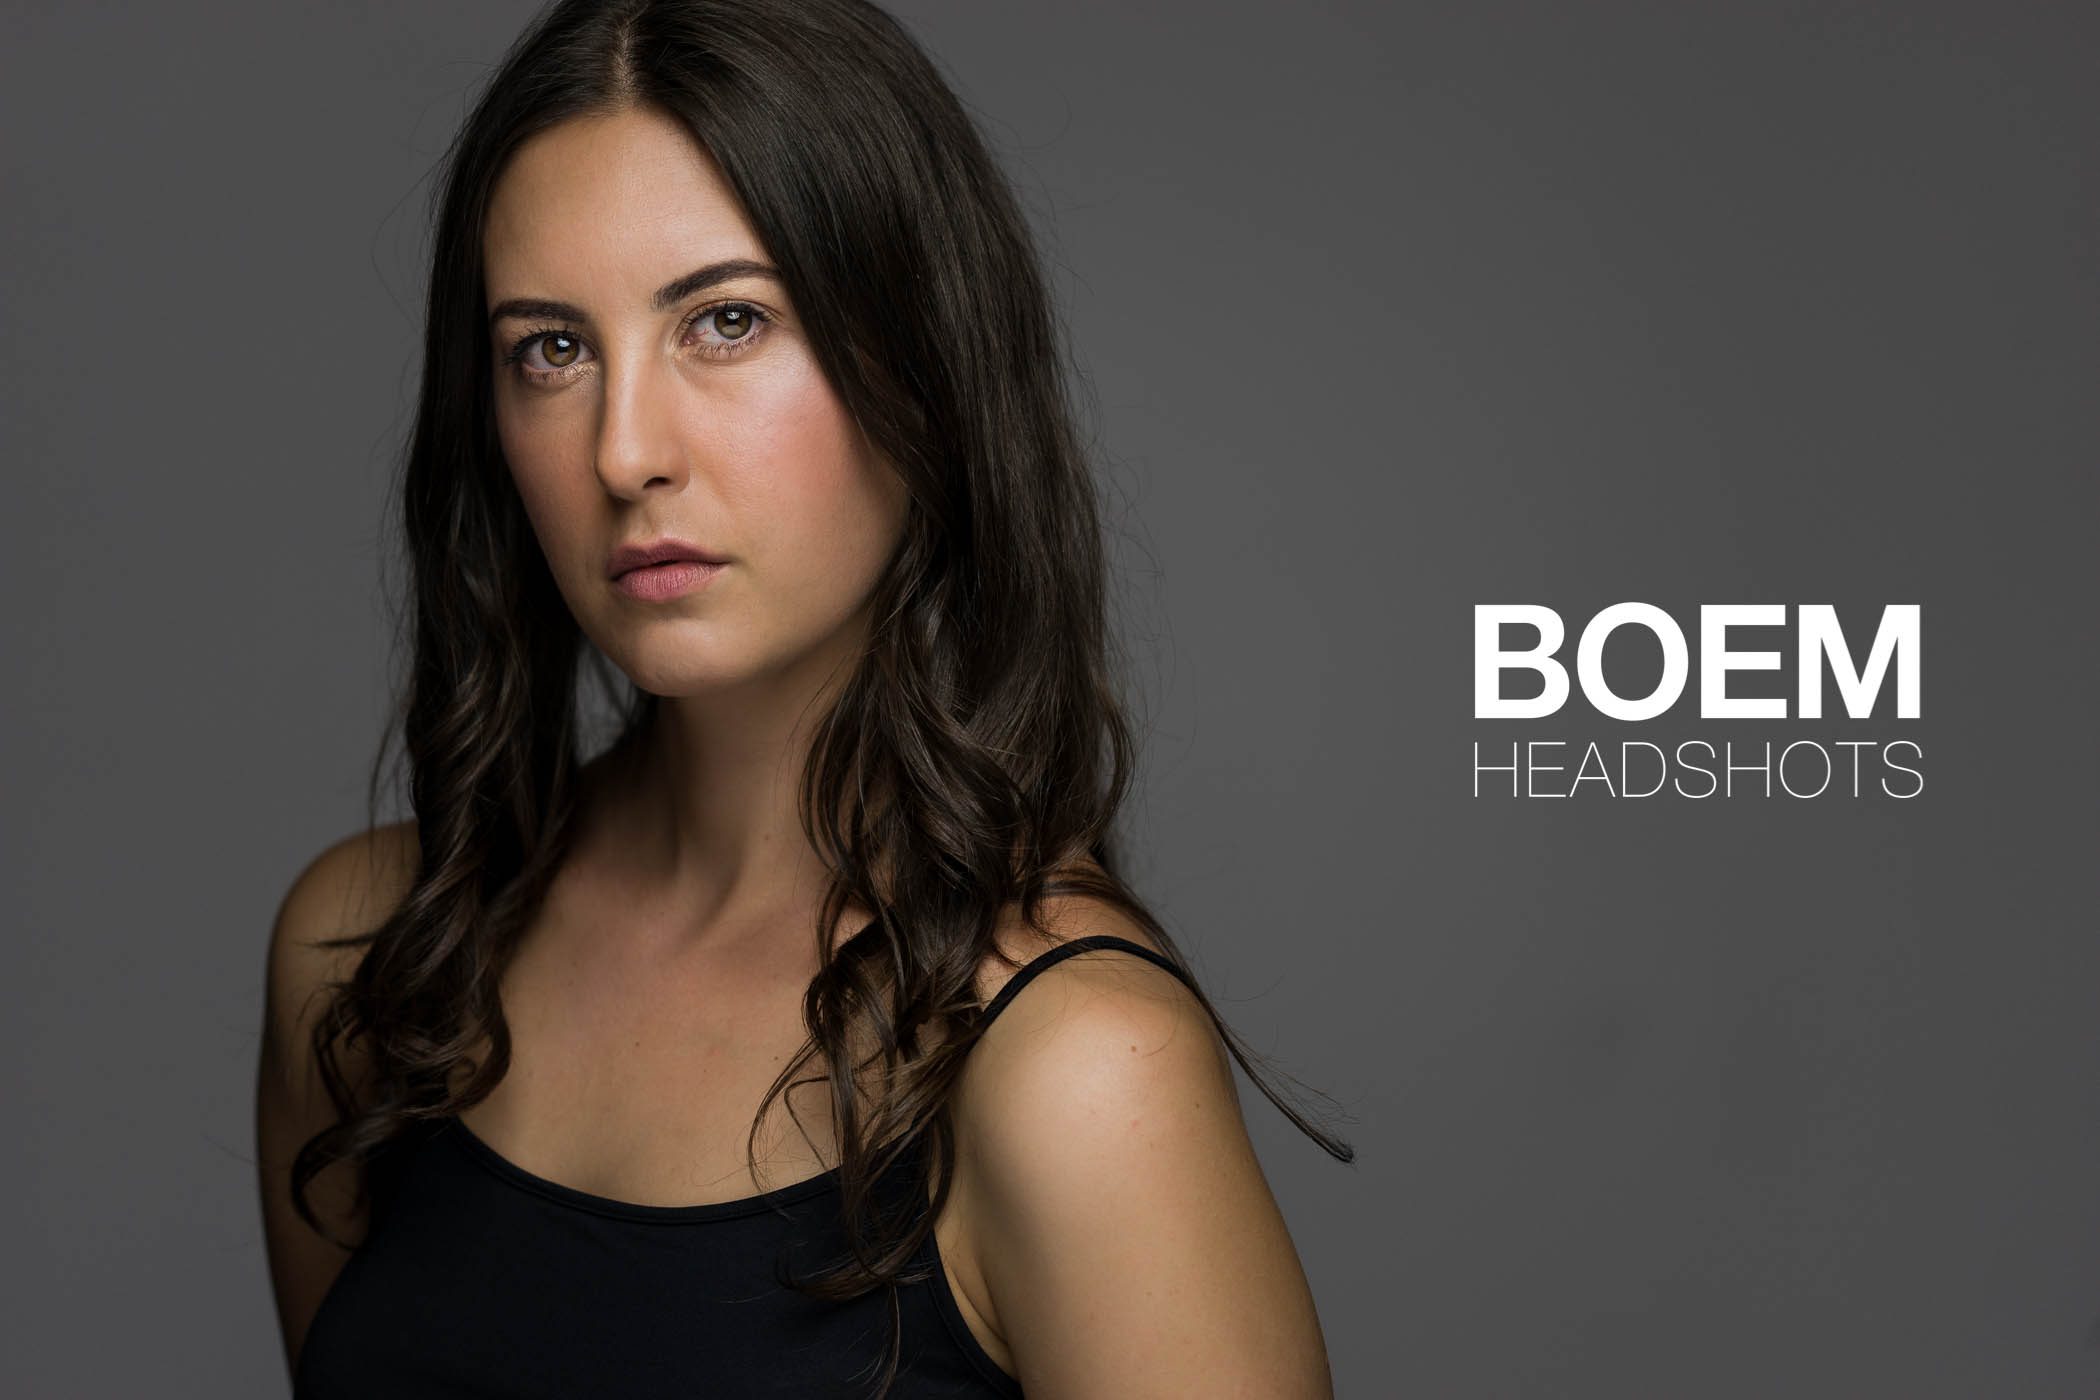 ROSIE :: A HEADSHOT SESSION